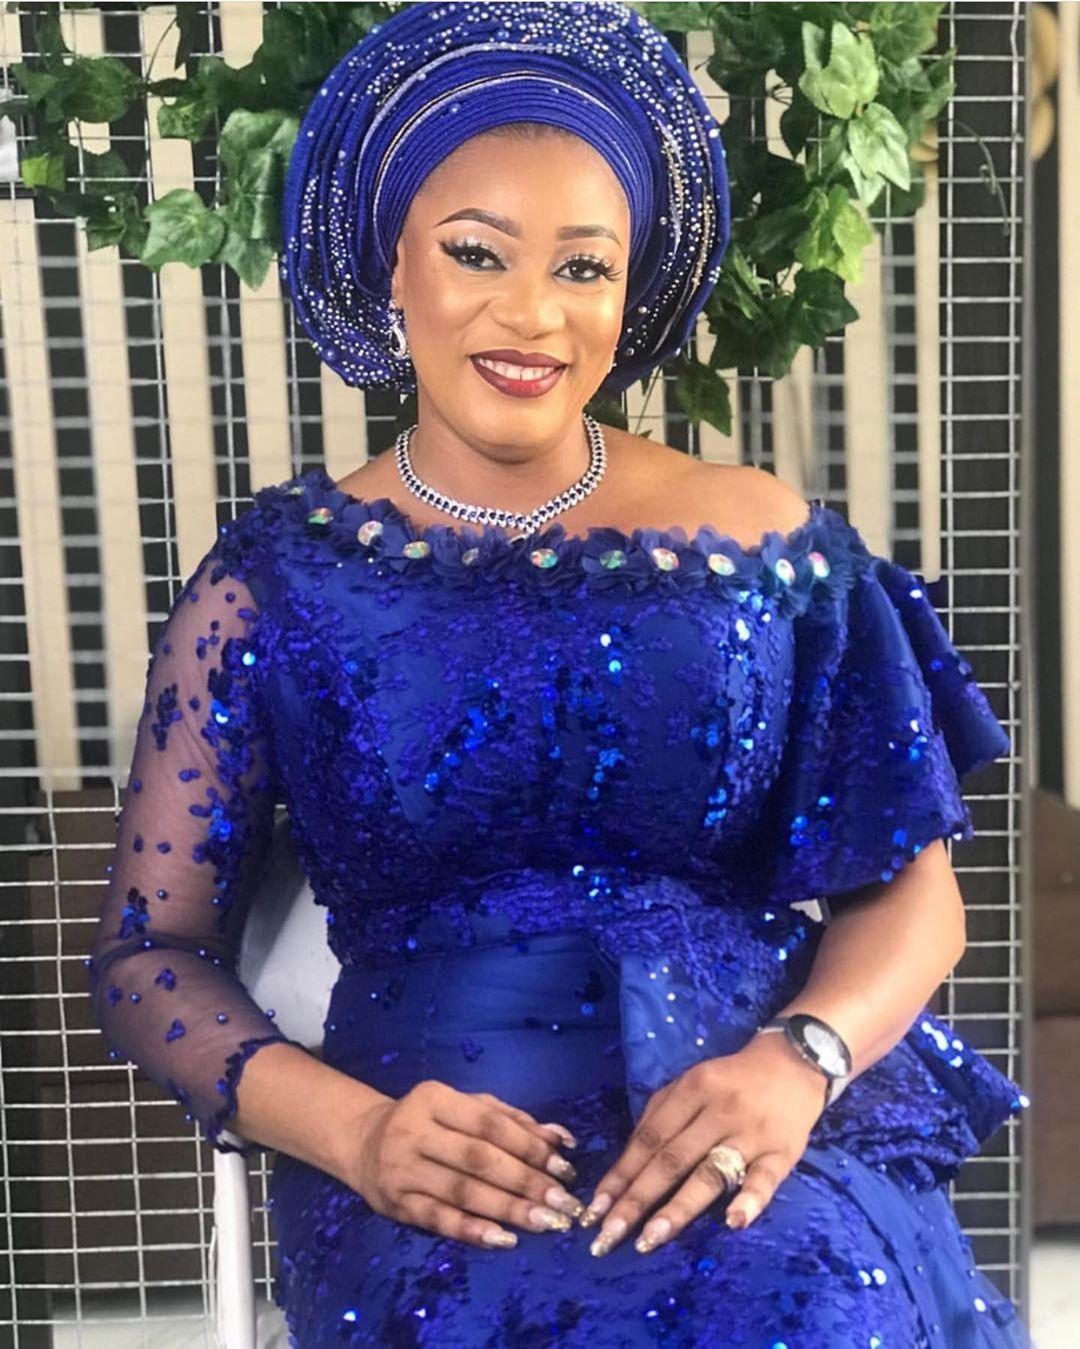 T N S Beautiful Tolulopeibironke Celebrating Beautiful Successful And Wonderfully African Lace Styles Nigerian Lace Dress African Fashion Skirts